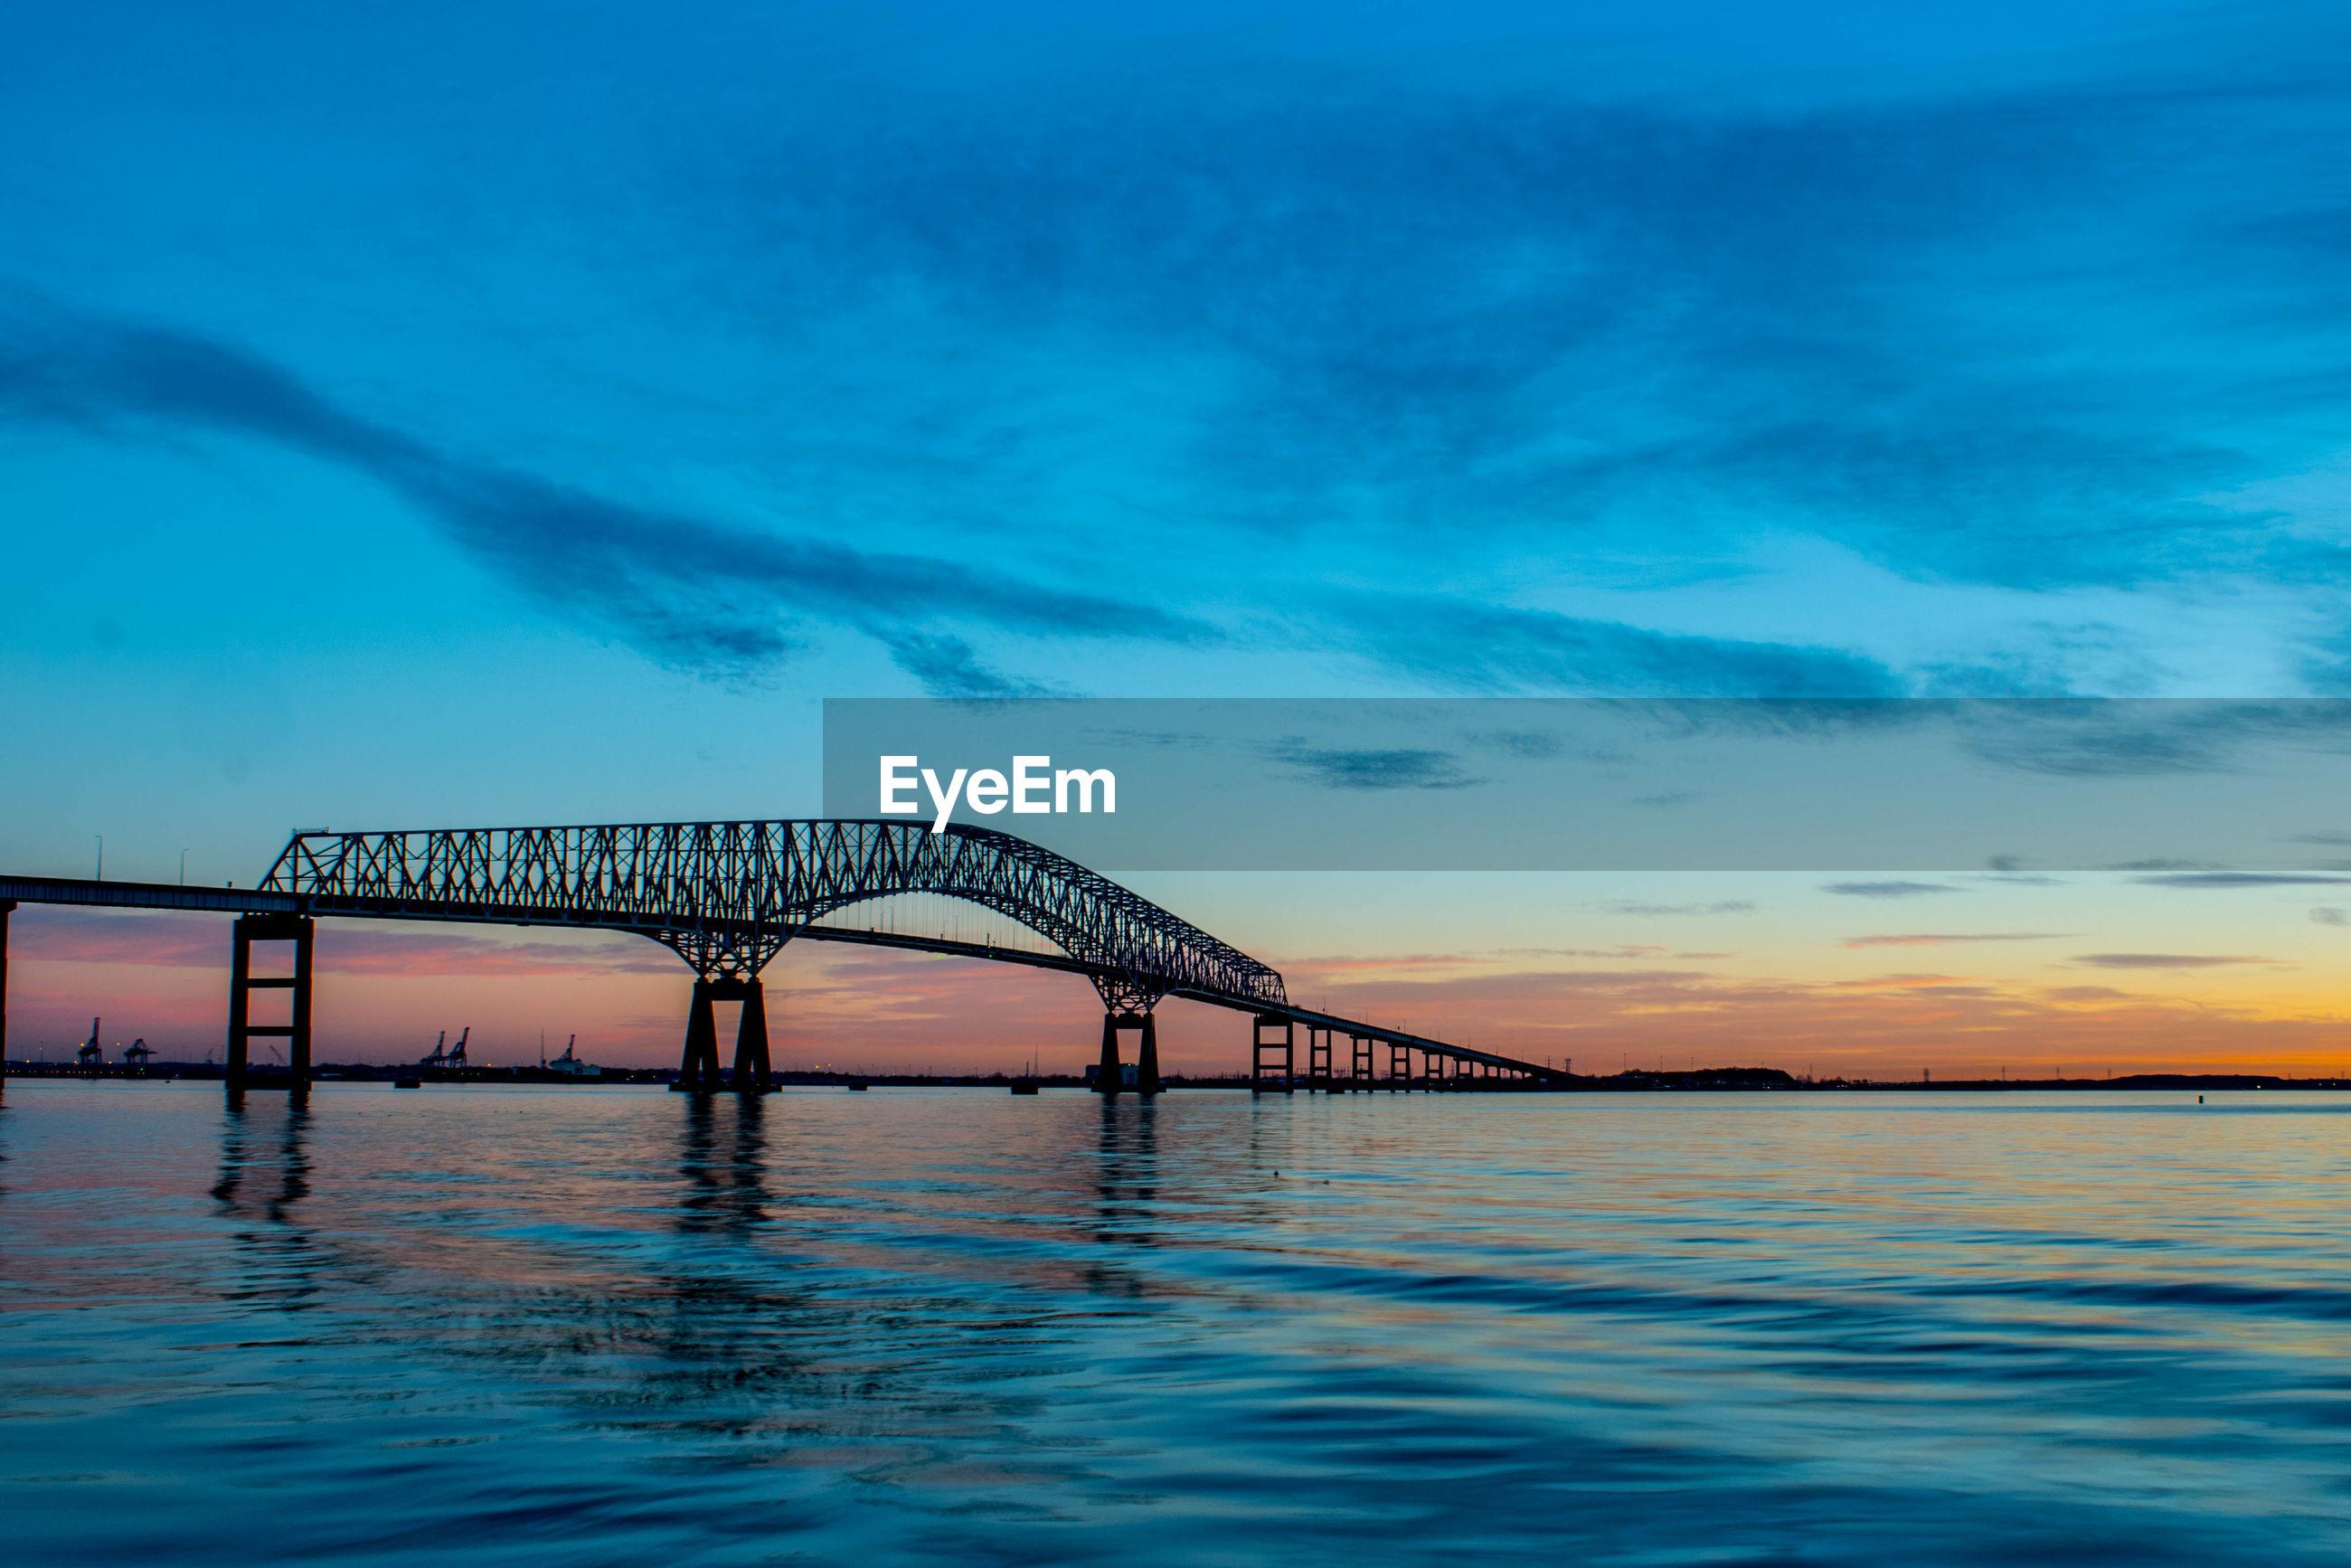 VIEW OF BRIDGE OVER SEA AGAINST SKY